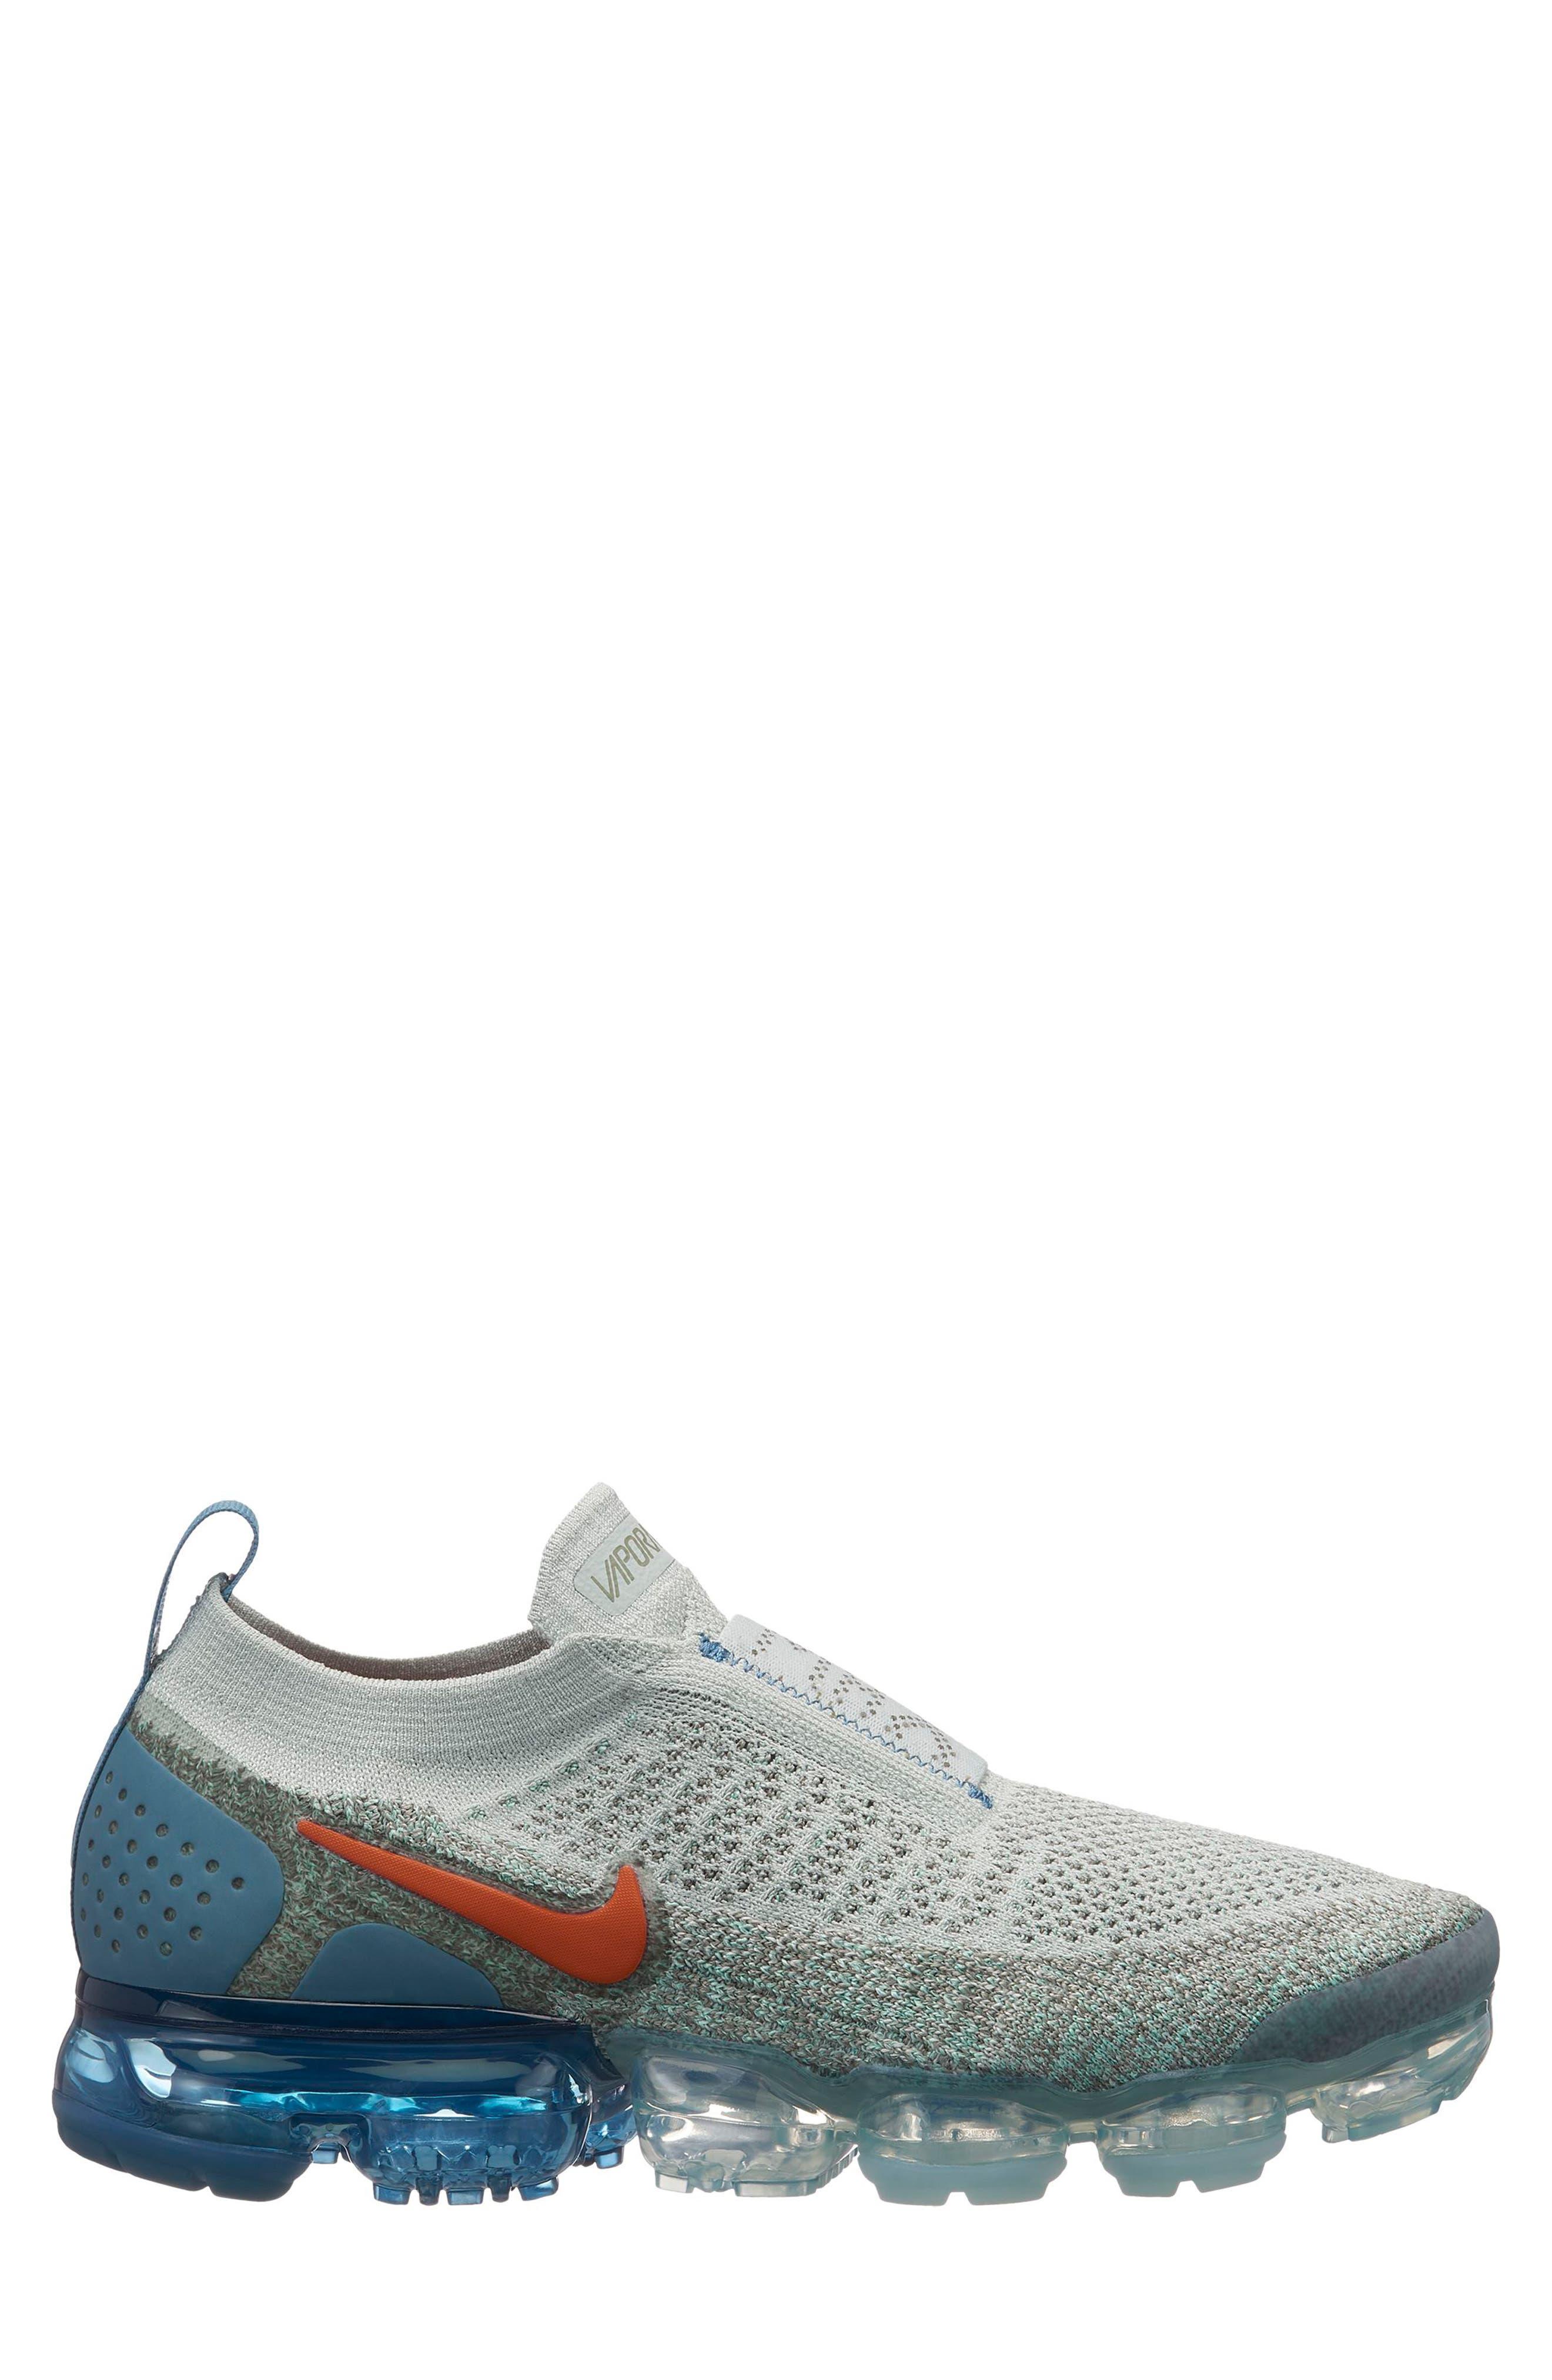 Air VaporMax Flyknit MOC 2 Running Shoe,                         Main,                         color, SILVER/ CAMPFIRE ORANGE/ BLACK